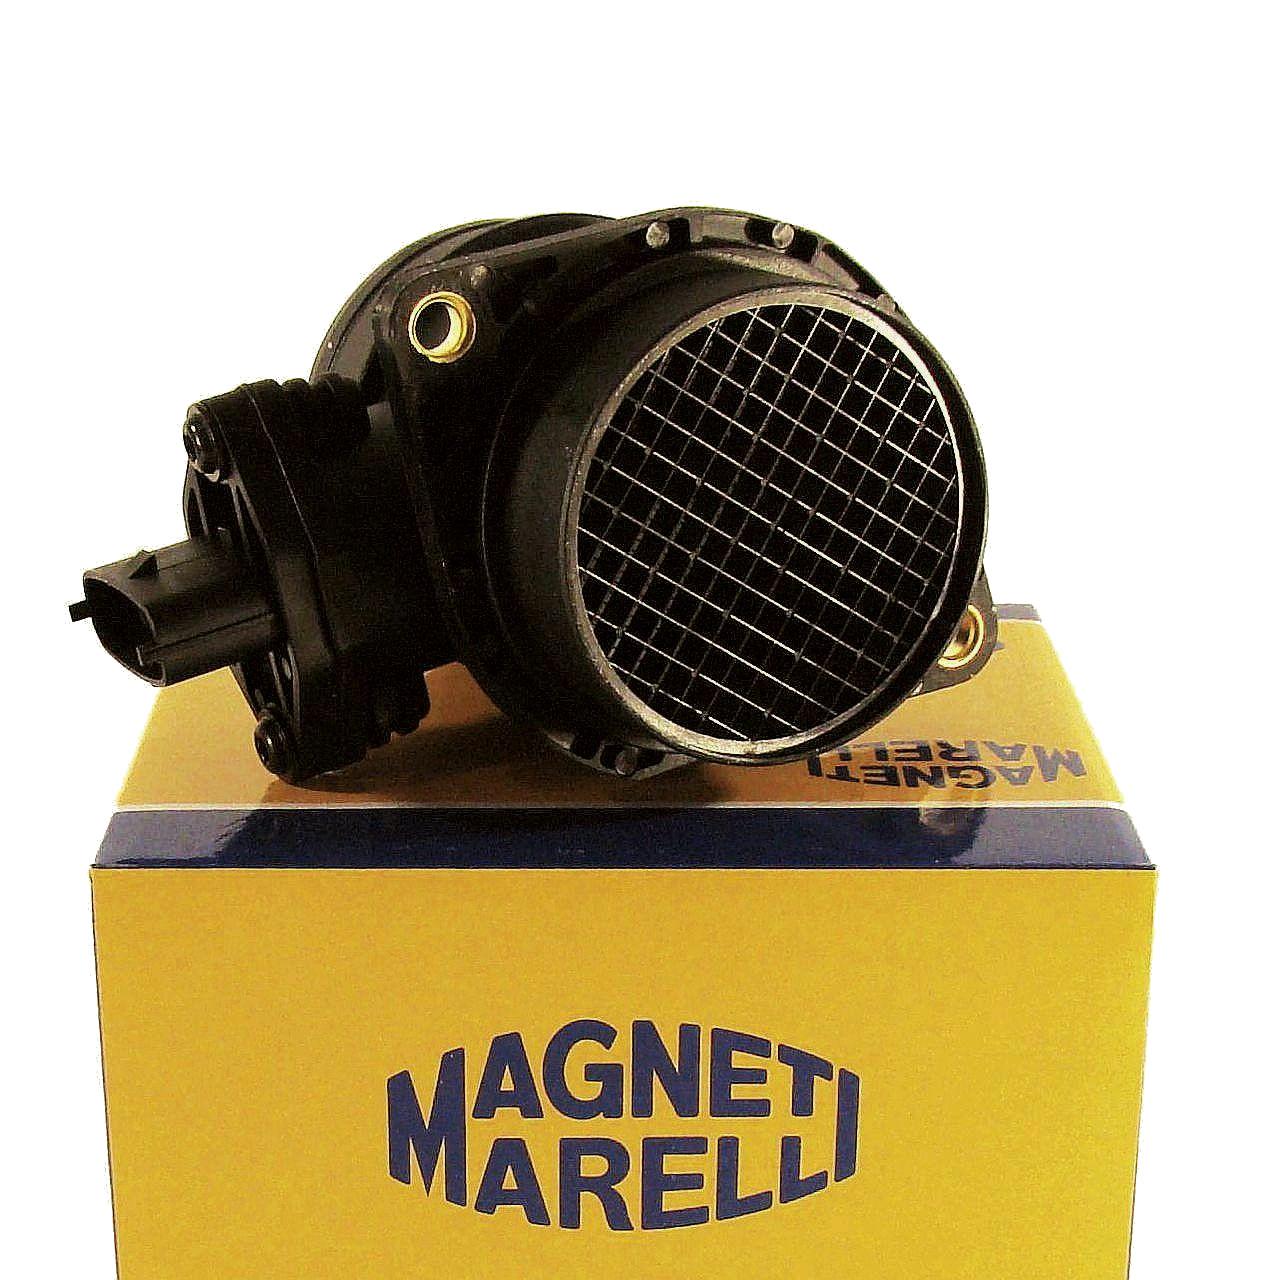 Massa Aria Lmm COLTELLO FIAT MULTIPLA 1.9 JTD BJ 03-10 STILO 1.9 Multijet BJ 03-10